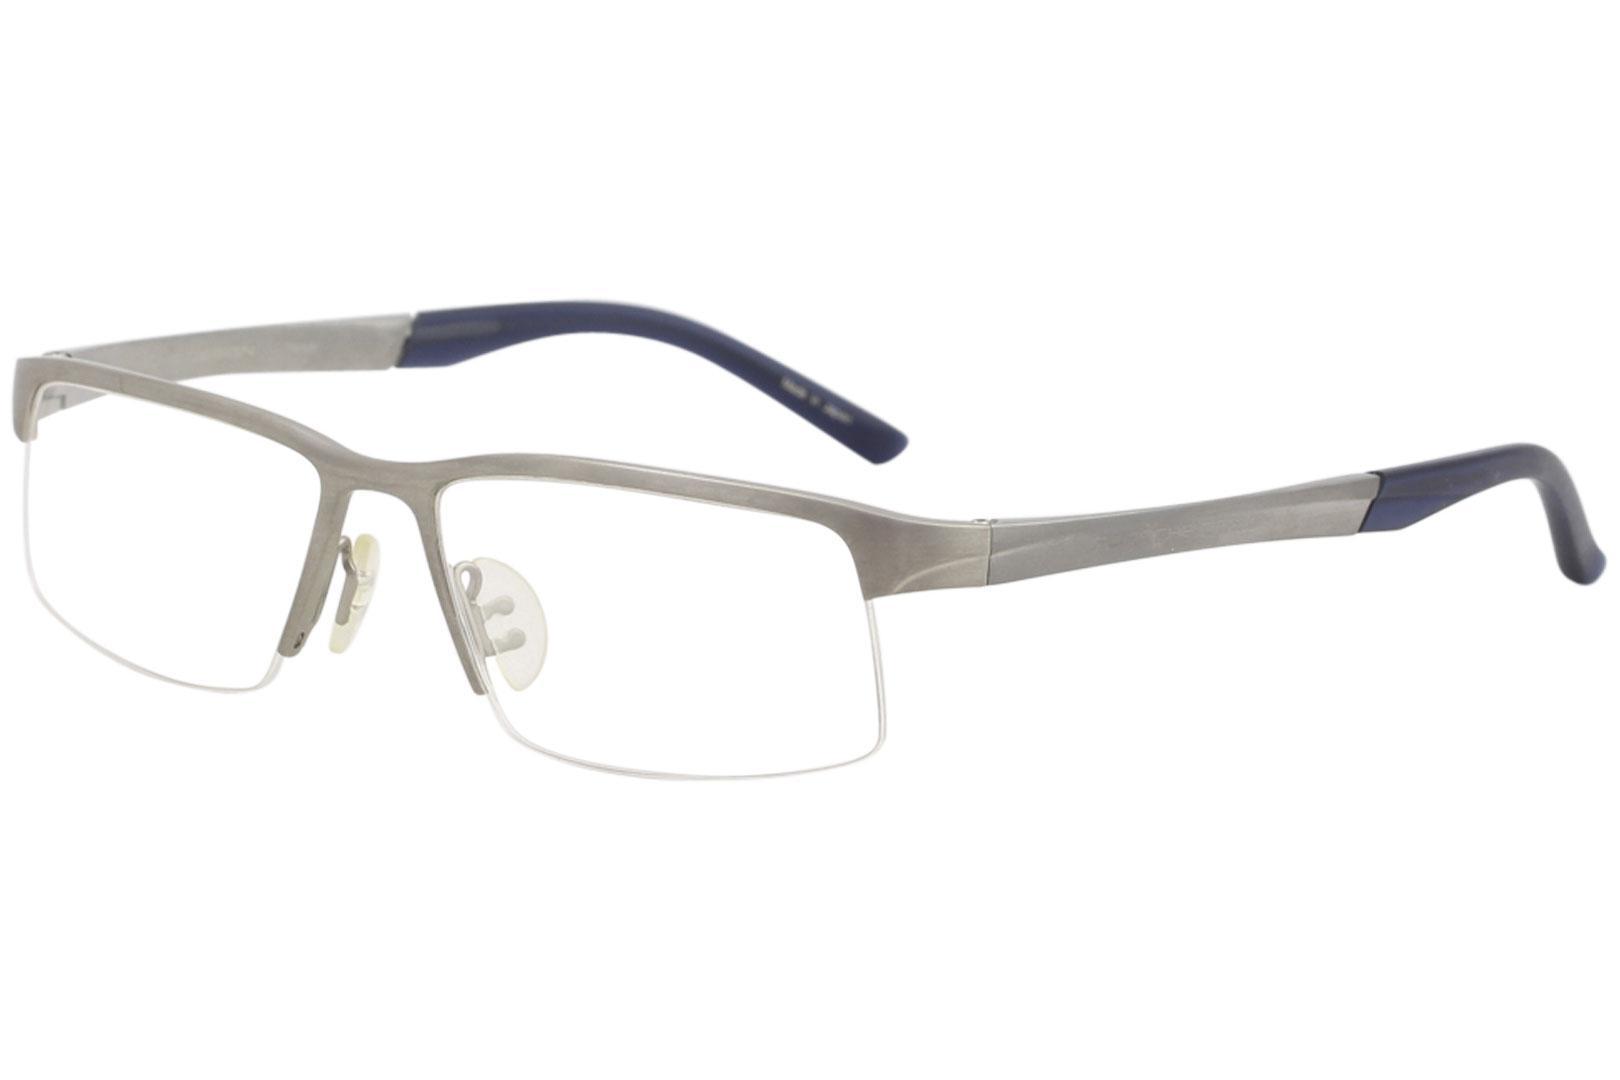 605e1decfba Porsche Design Men s Eyeglasses P8166 P 8166 Half Rim Titanium Optical Frame  by Porsche Design